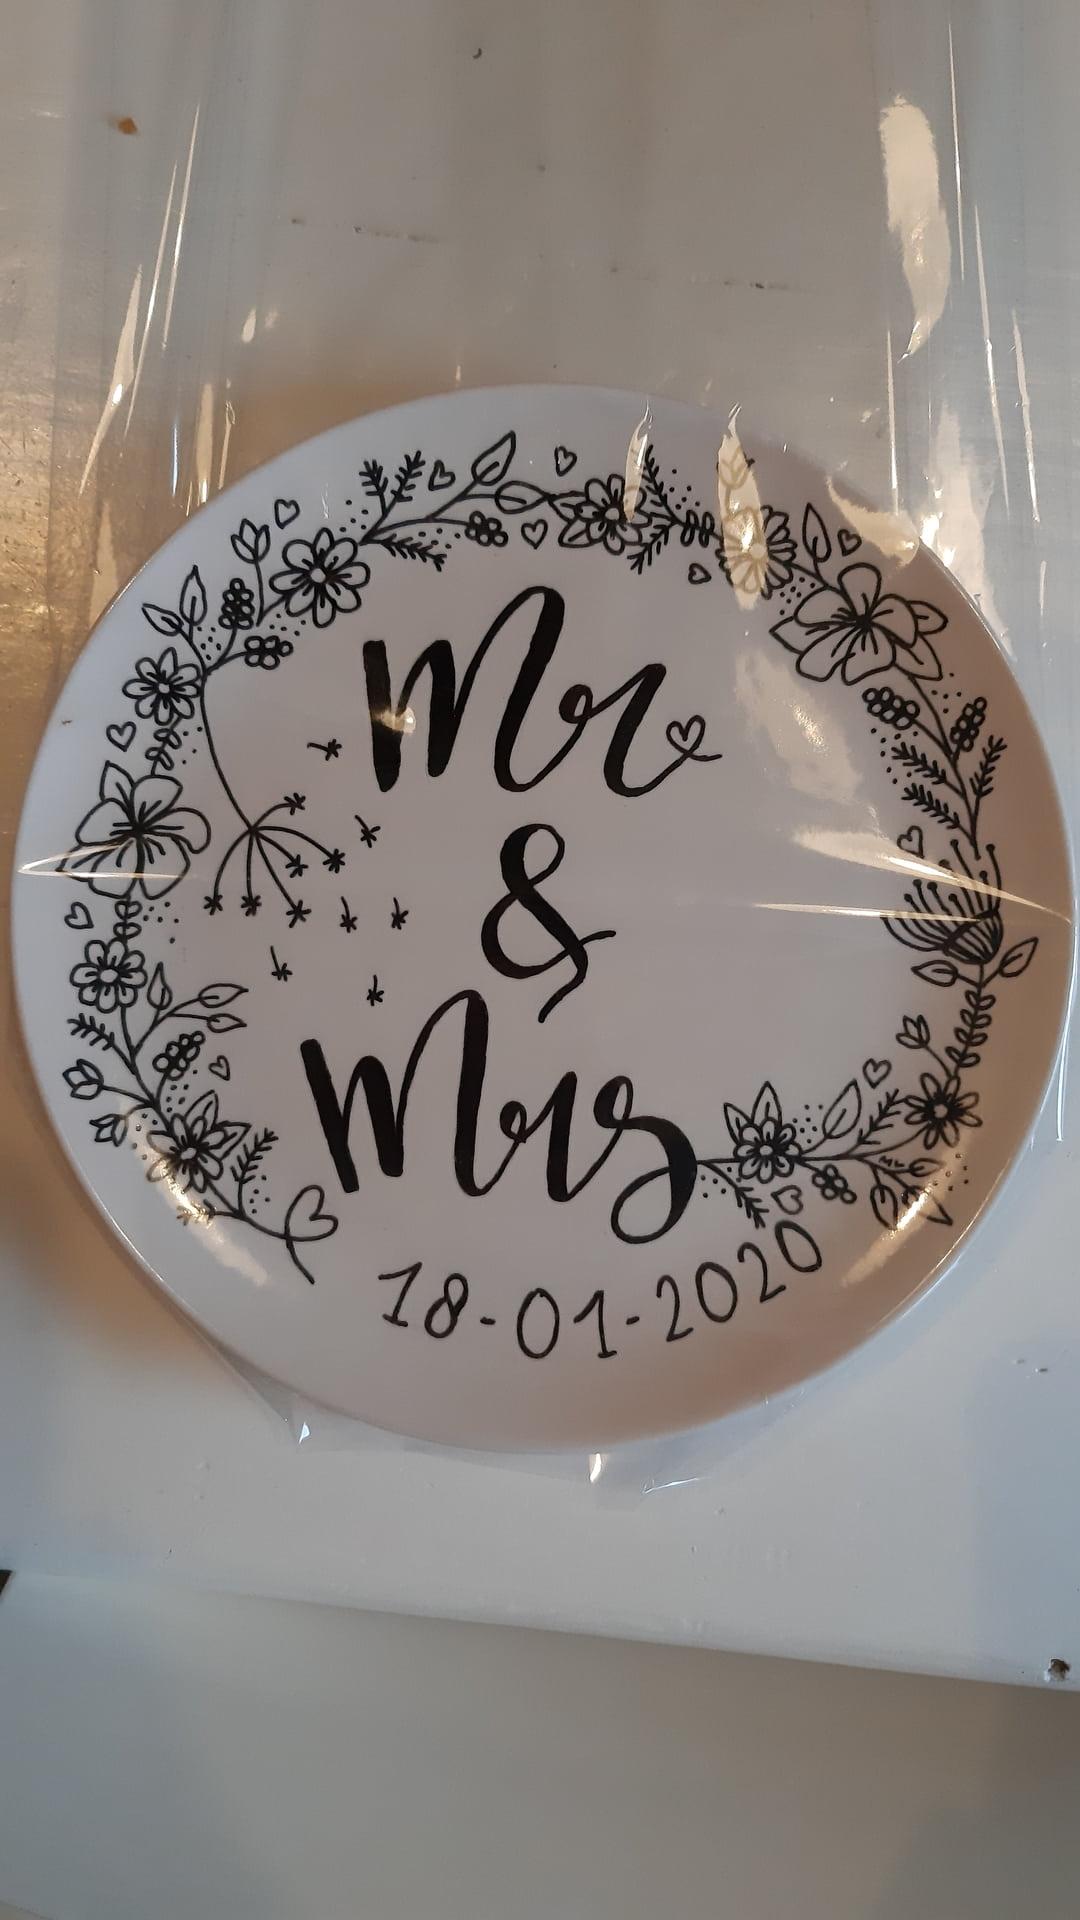 ZEG MAAR YES - Event & Wedding Fair - SeventyFour Creations